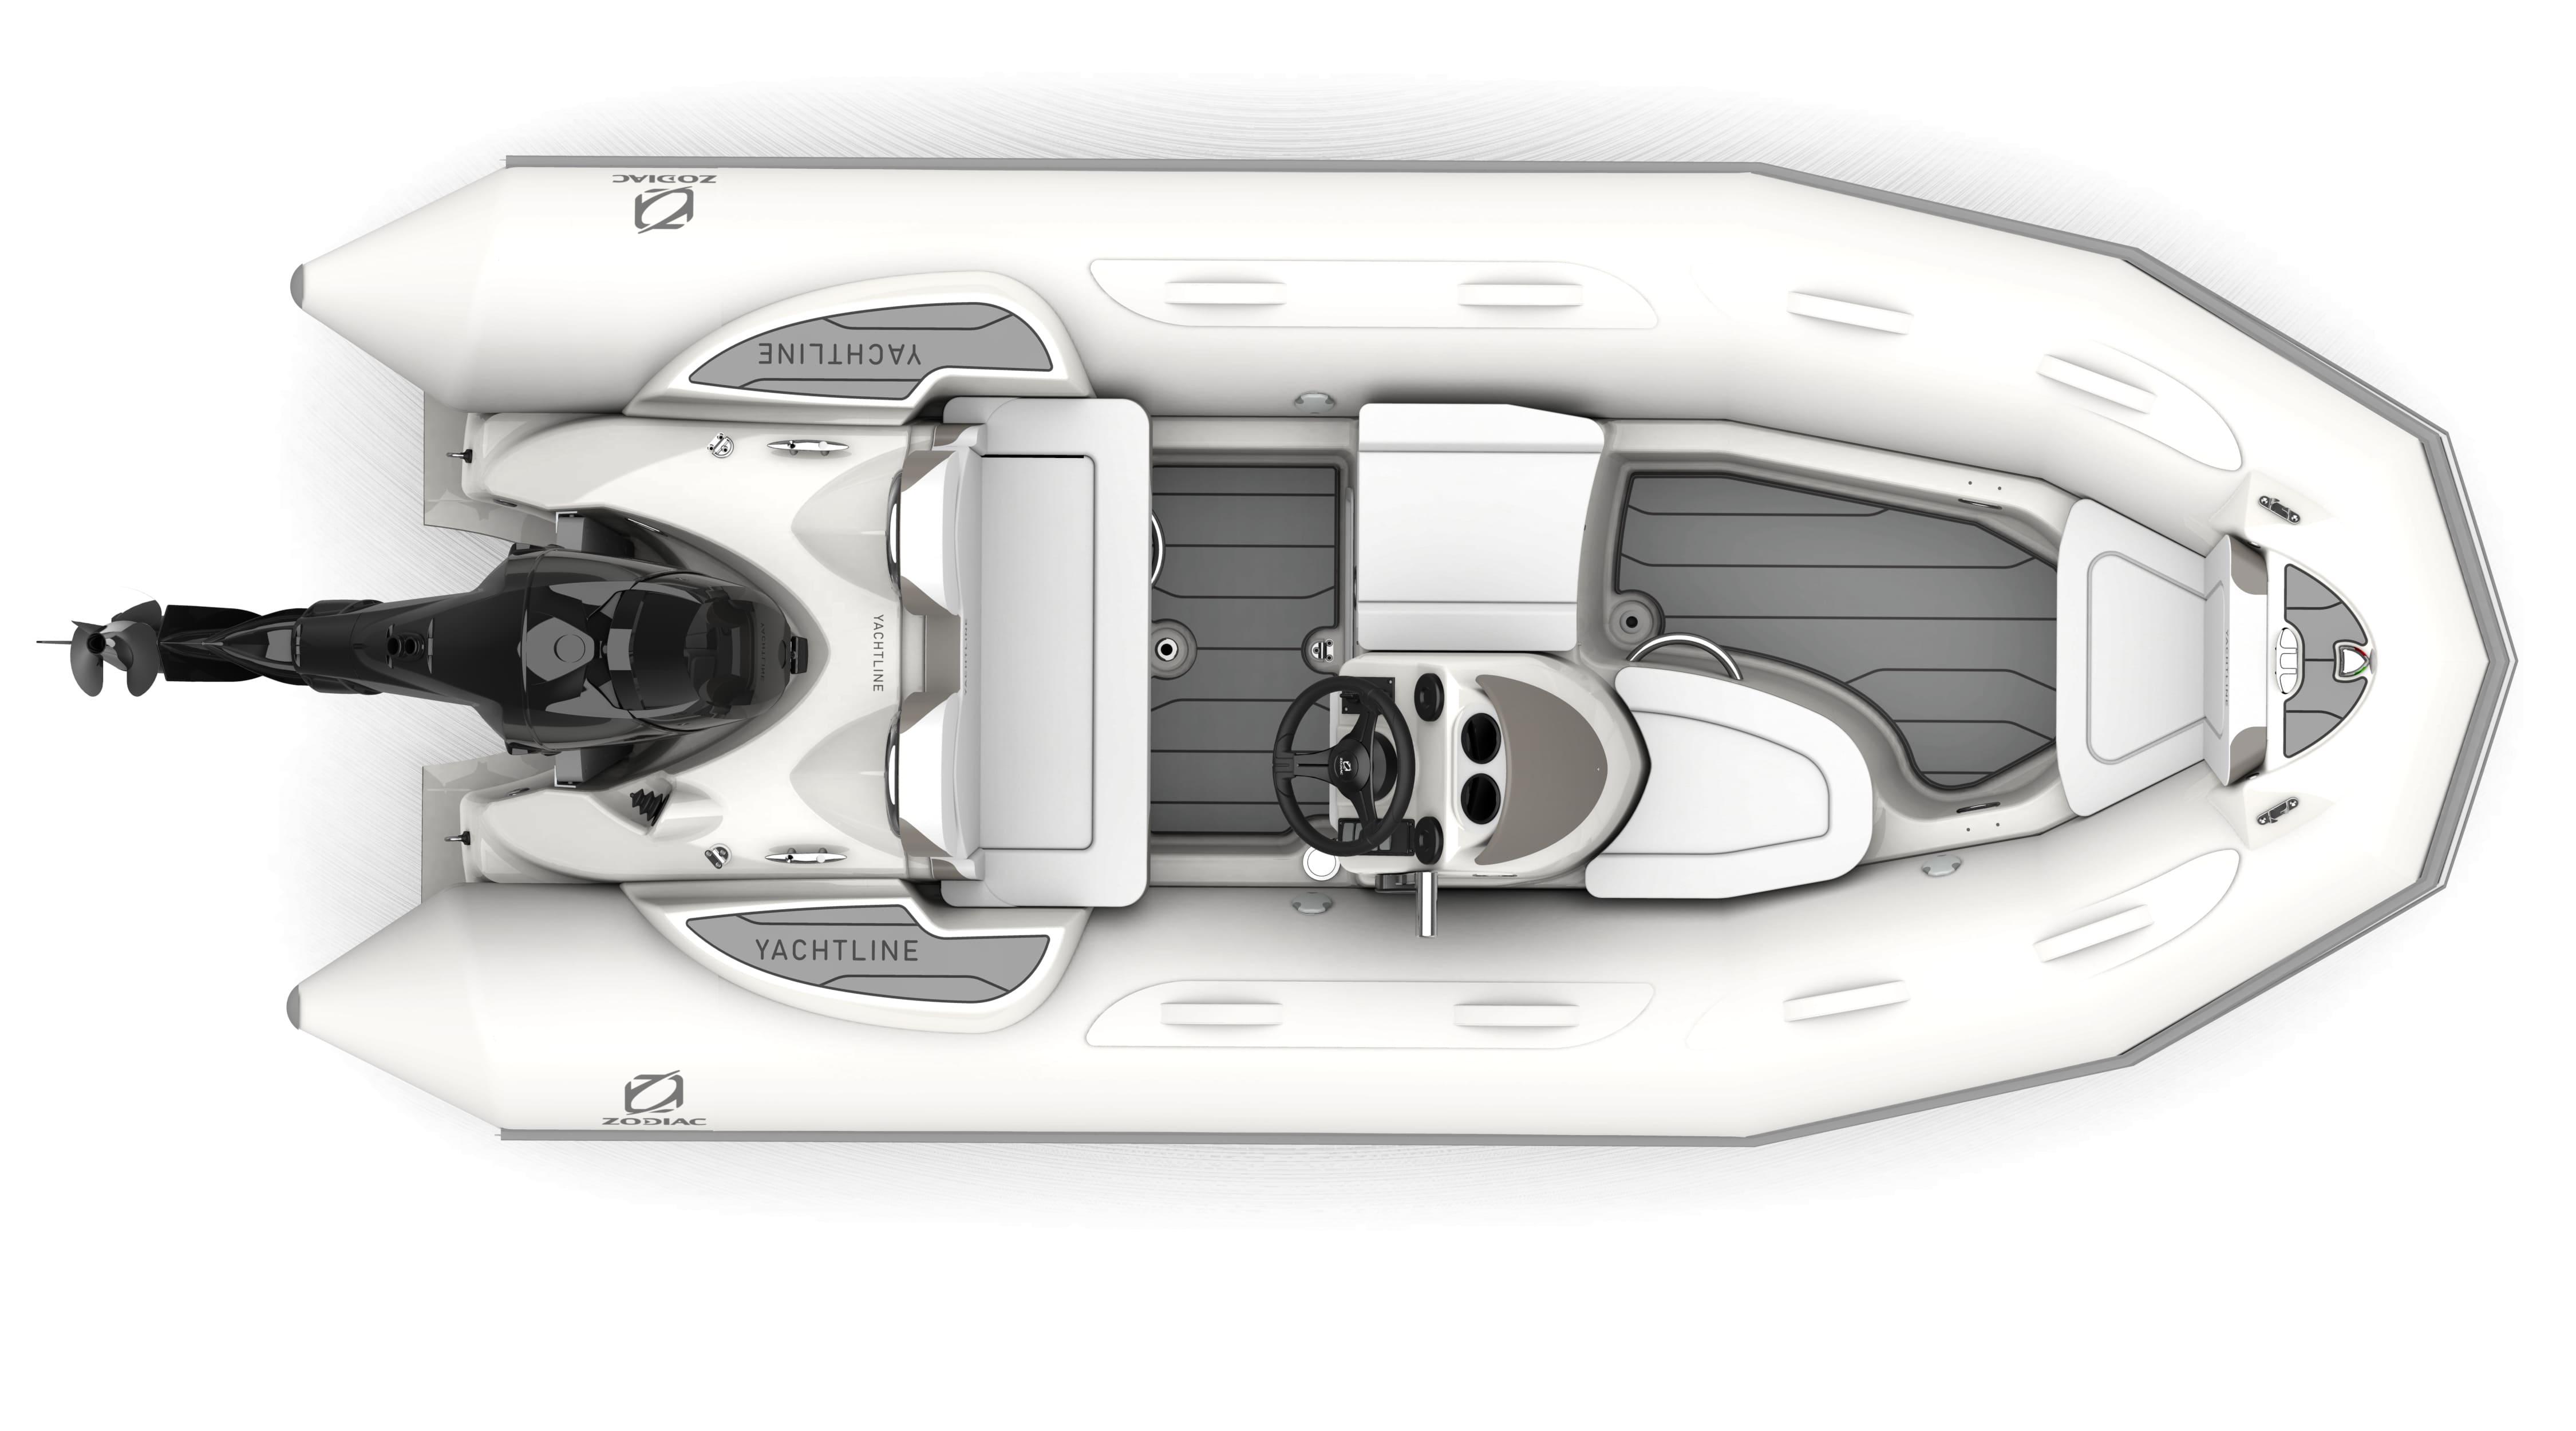 Yachtline 400